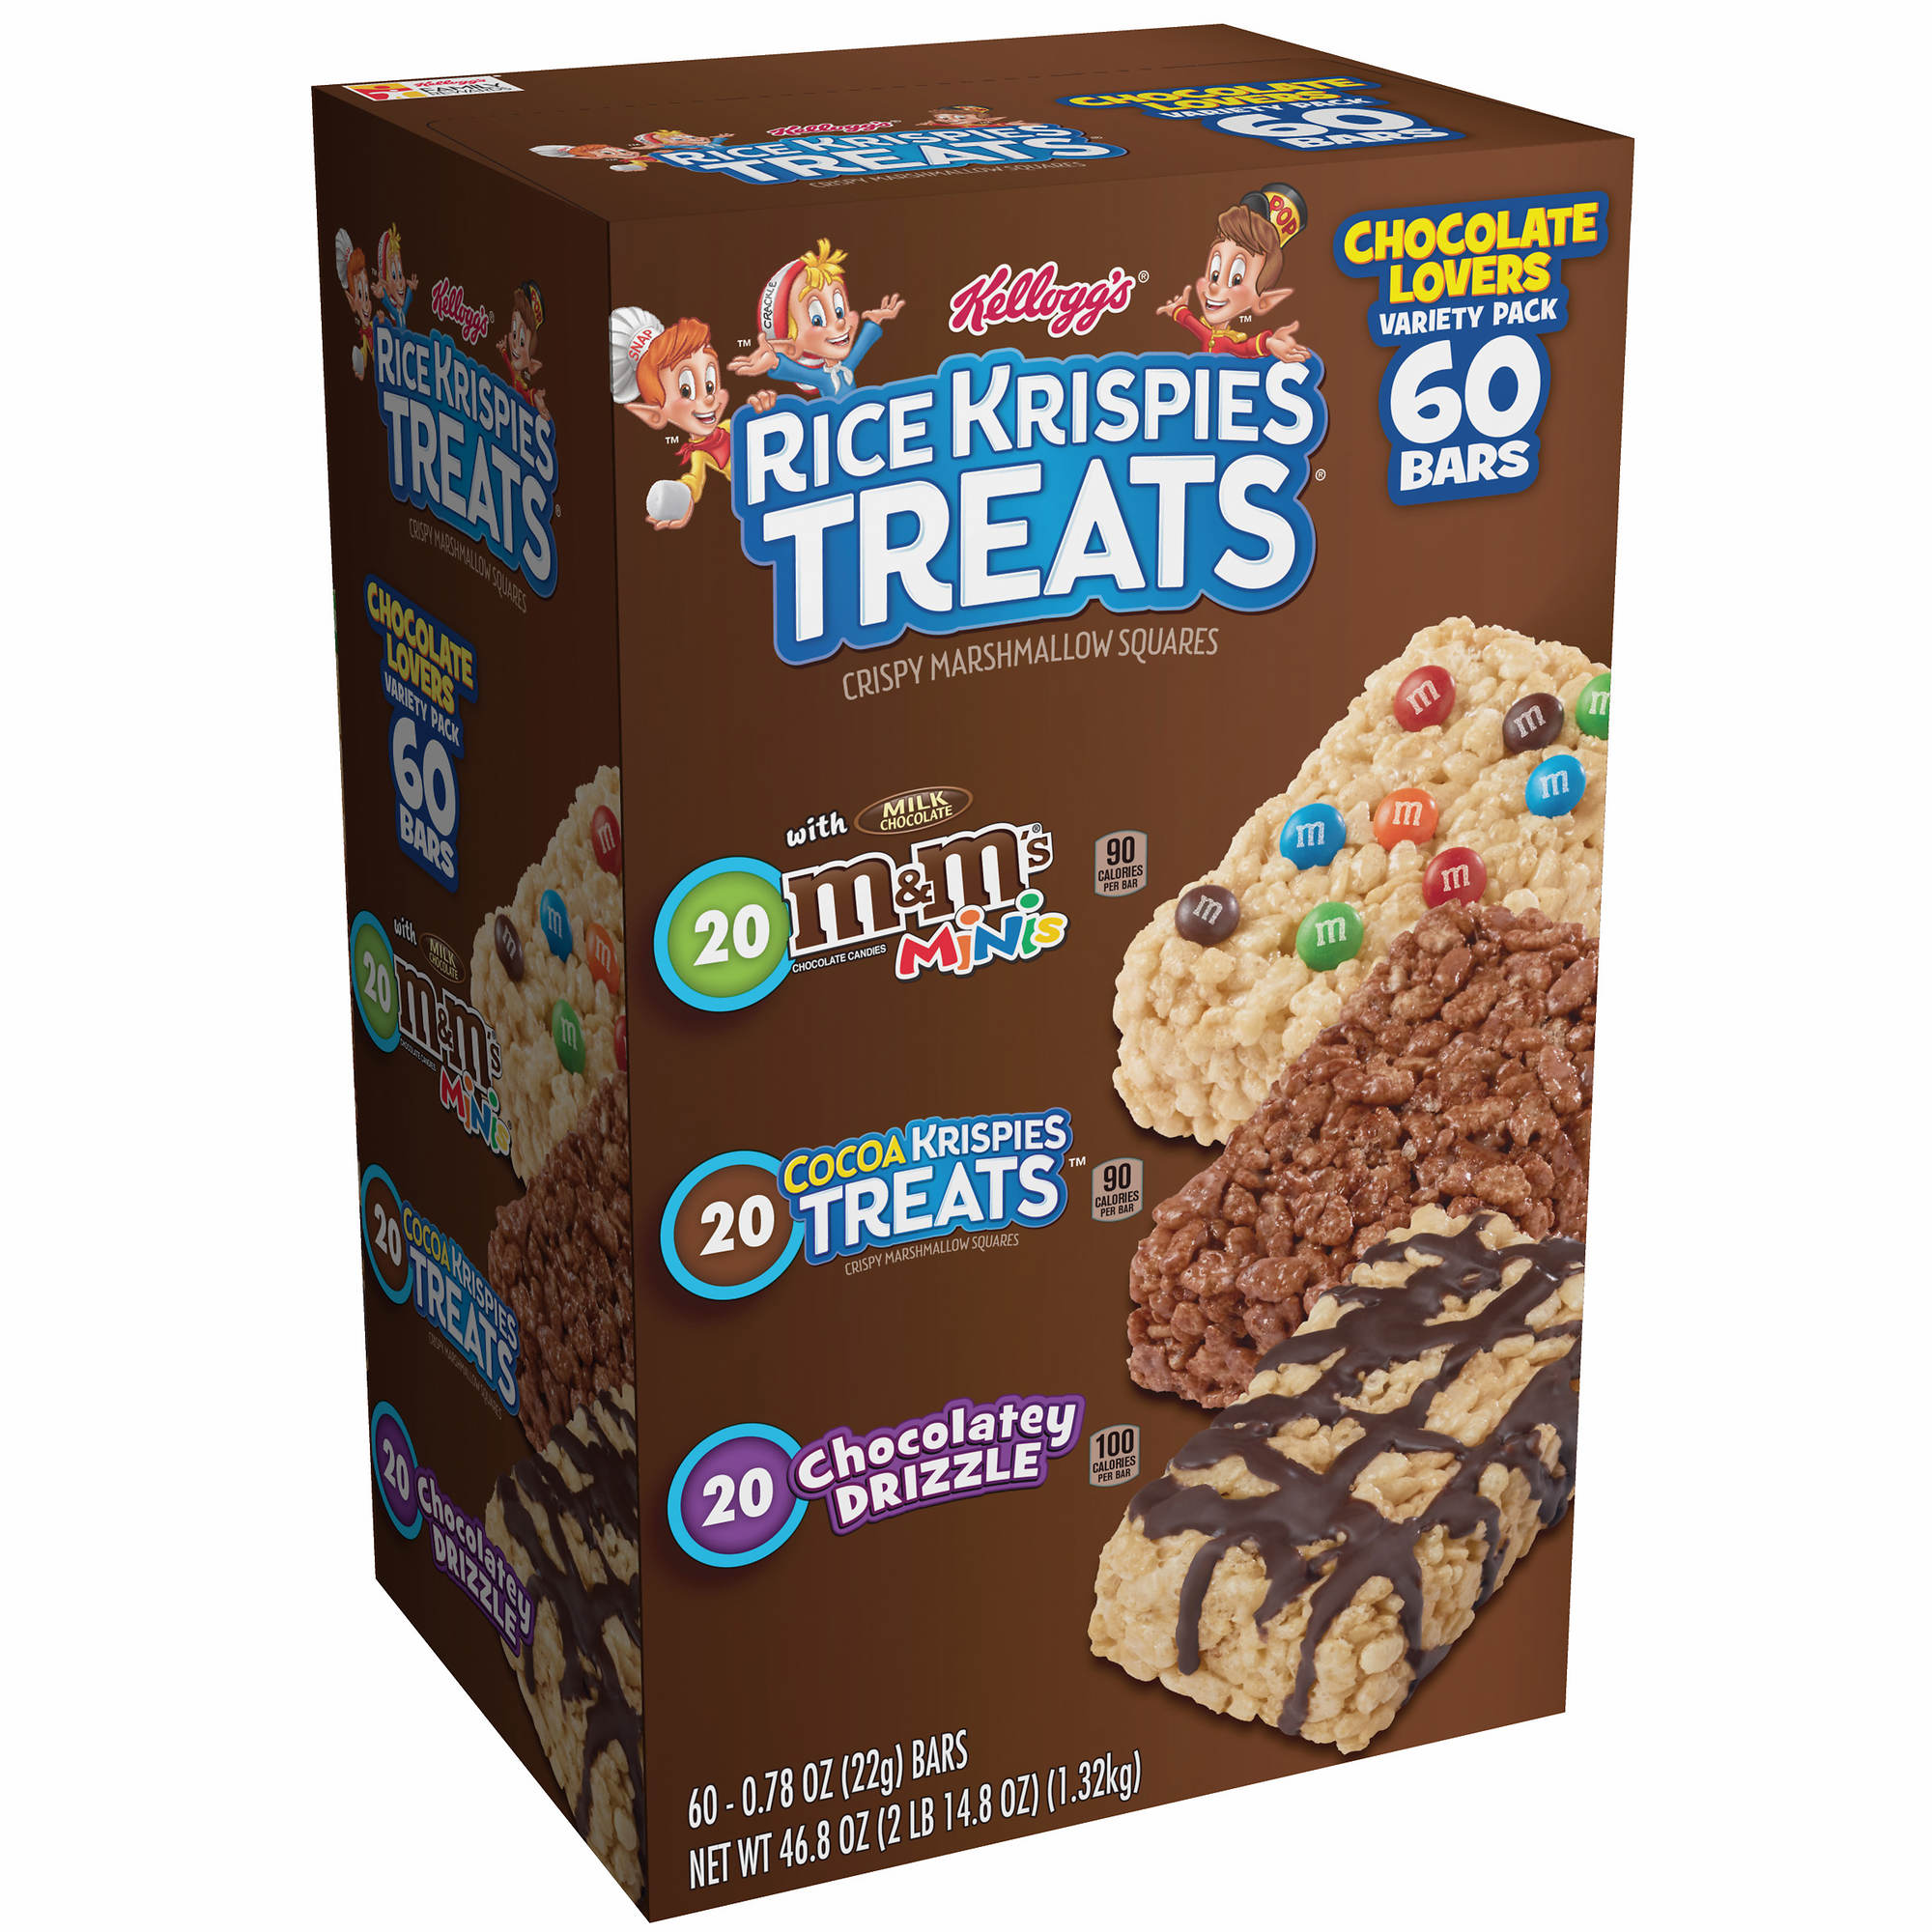 Kellogg S Rice Krispies Treats Variety Pack 60 Ct 0 78 Oz Walmart Com Walmart Com